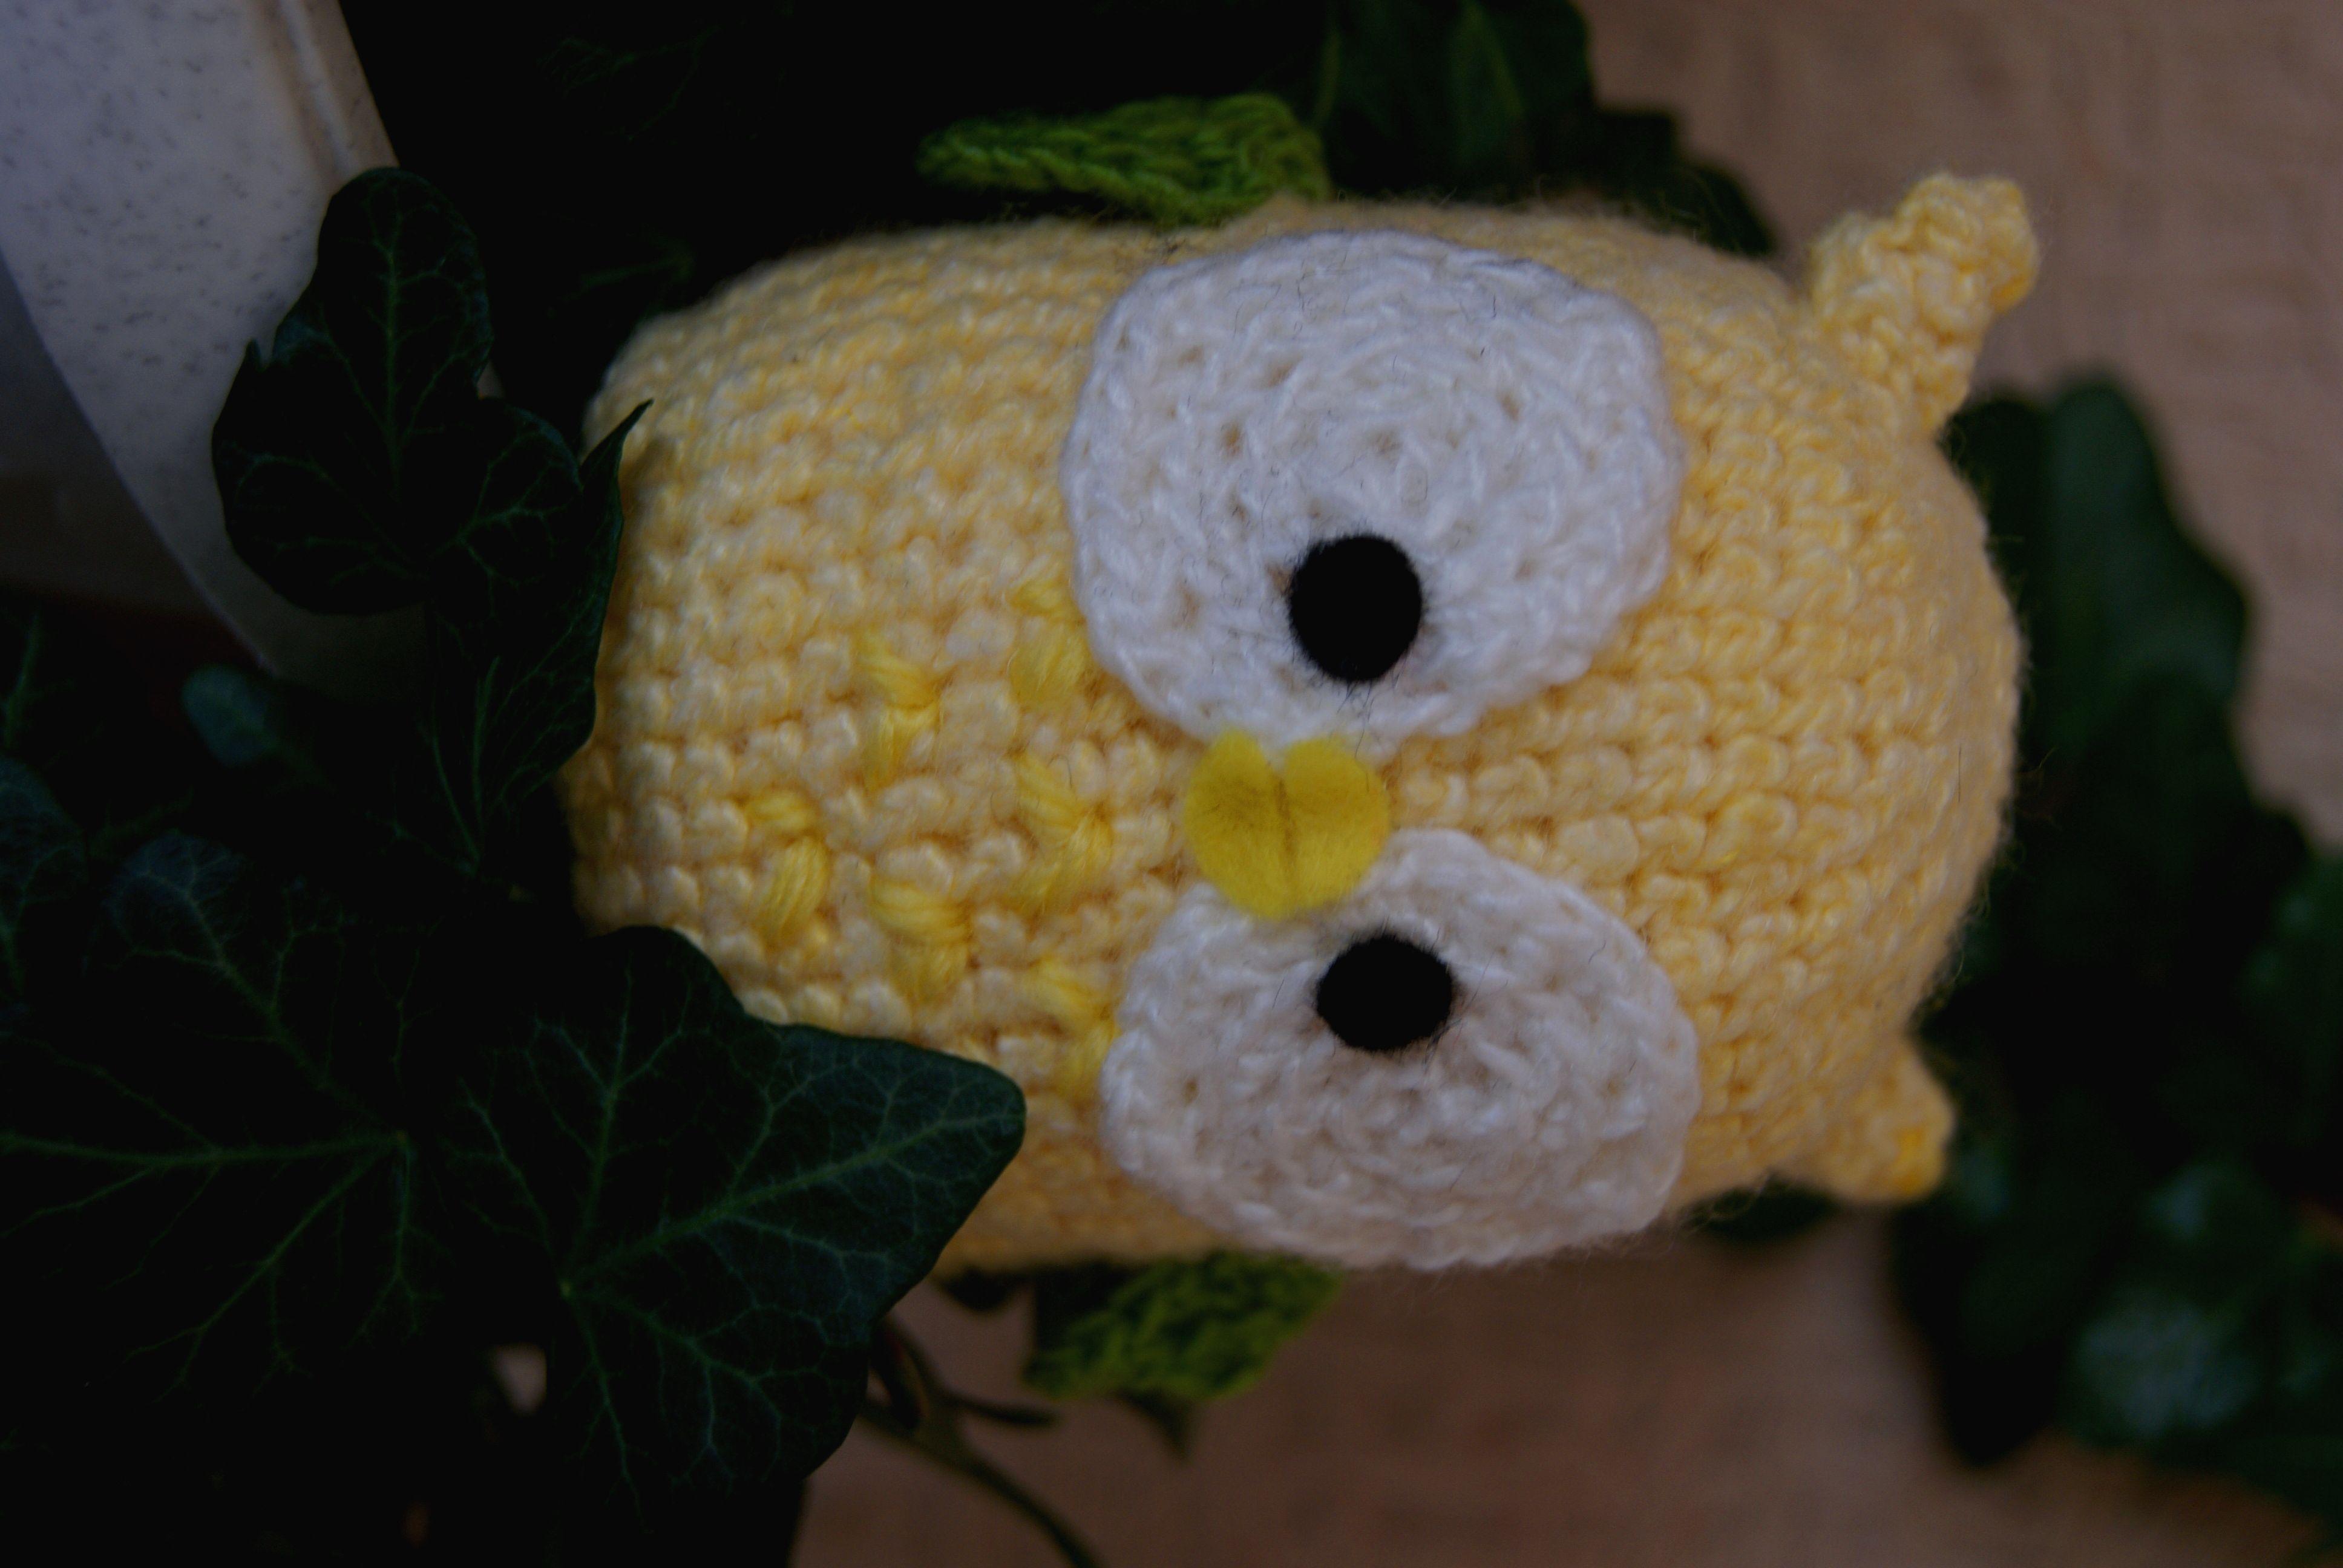 вяжутнетолькобабушки вязаниеназаказ игрушка вяжуназаказ декор вязание сова дом тепло интерьернаяигрушка птица уют